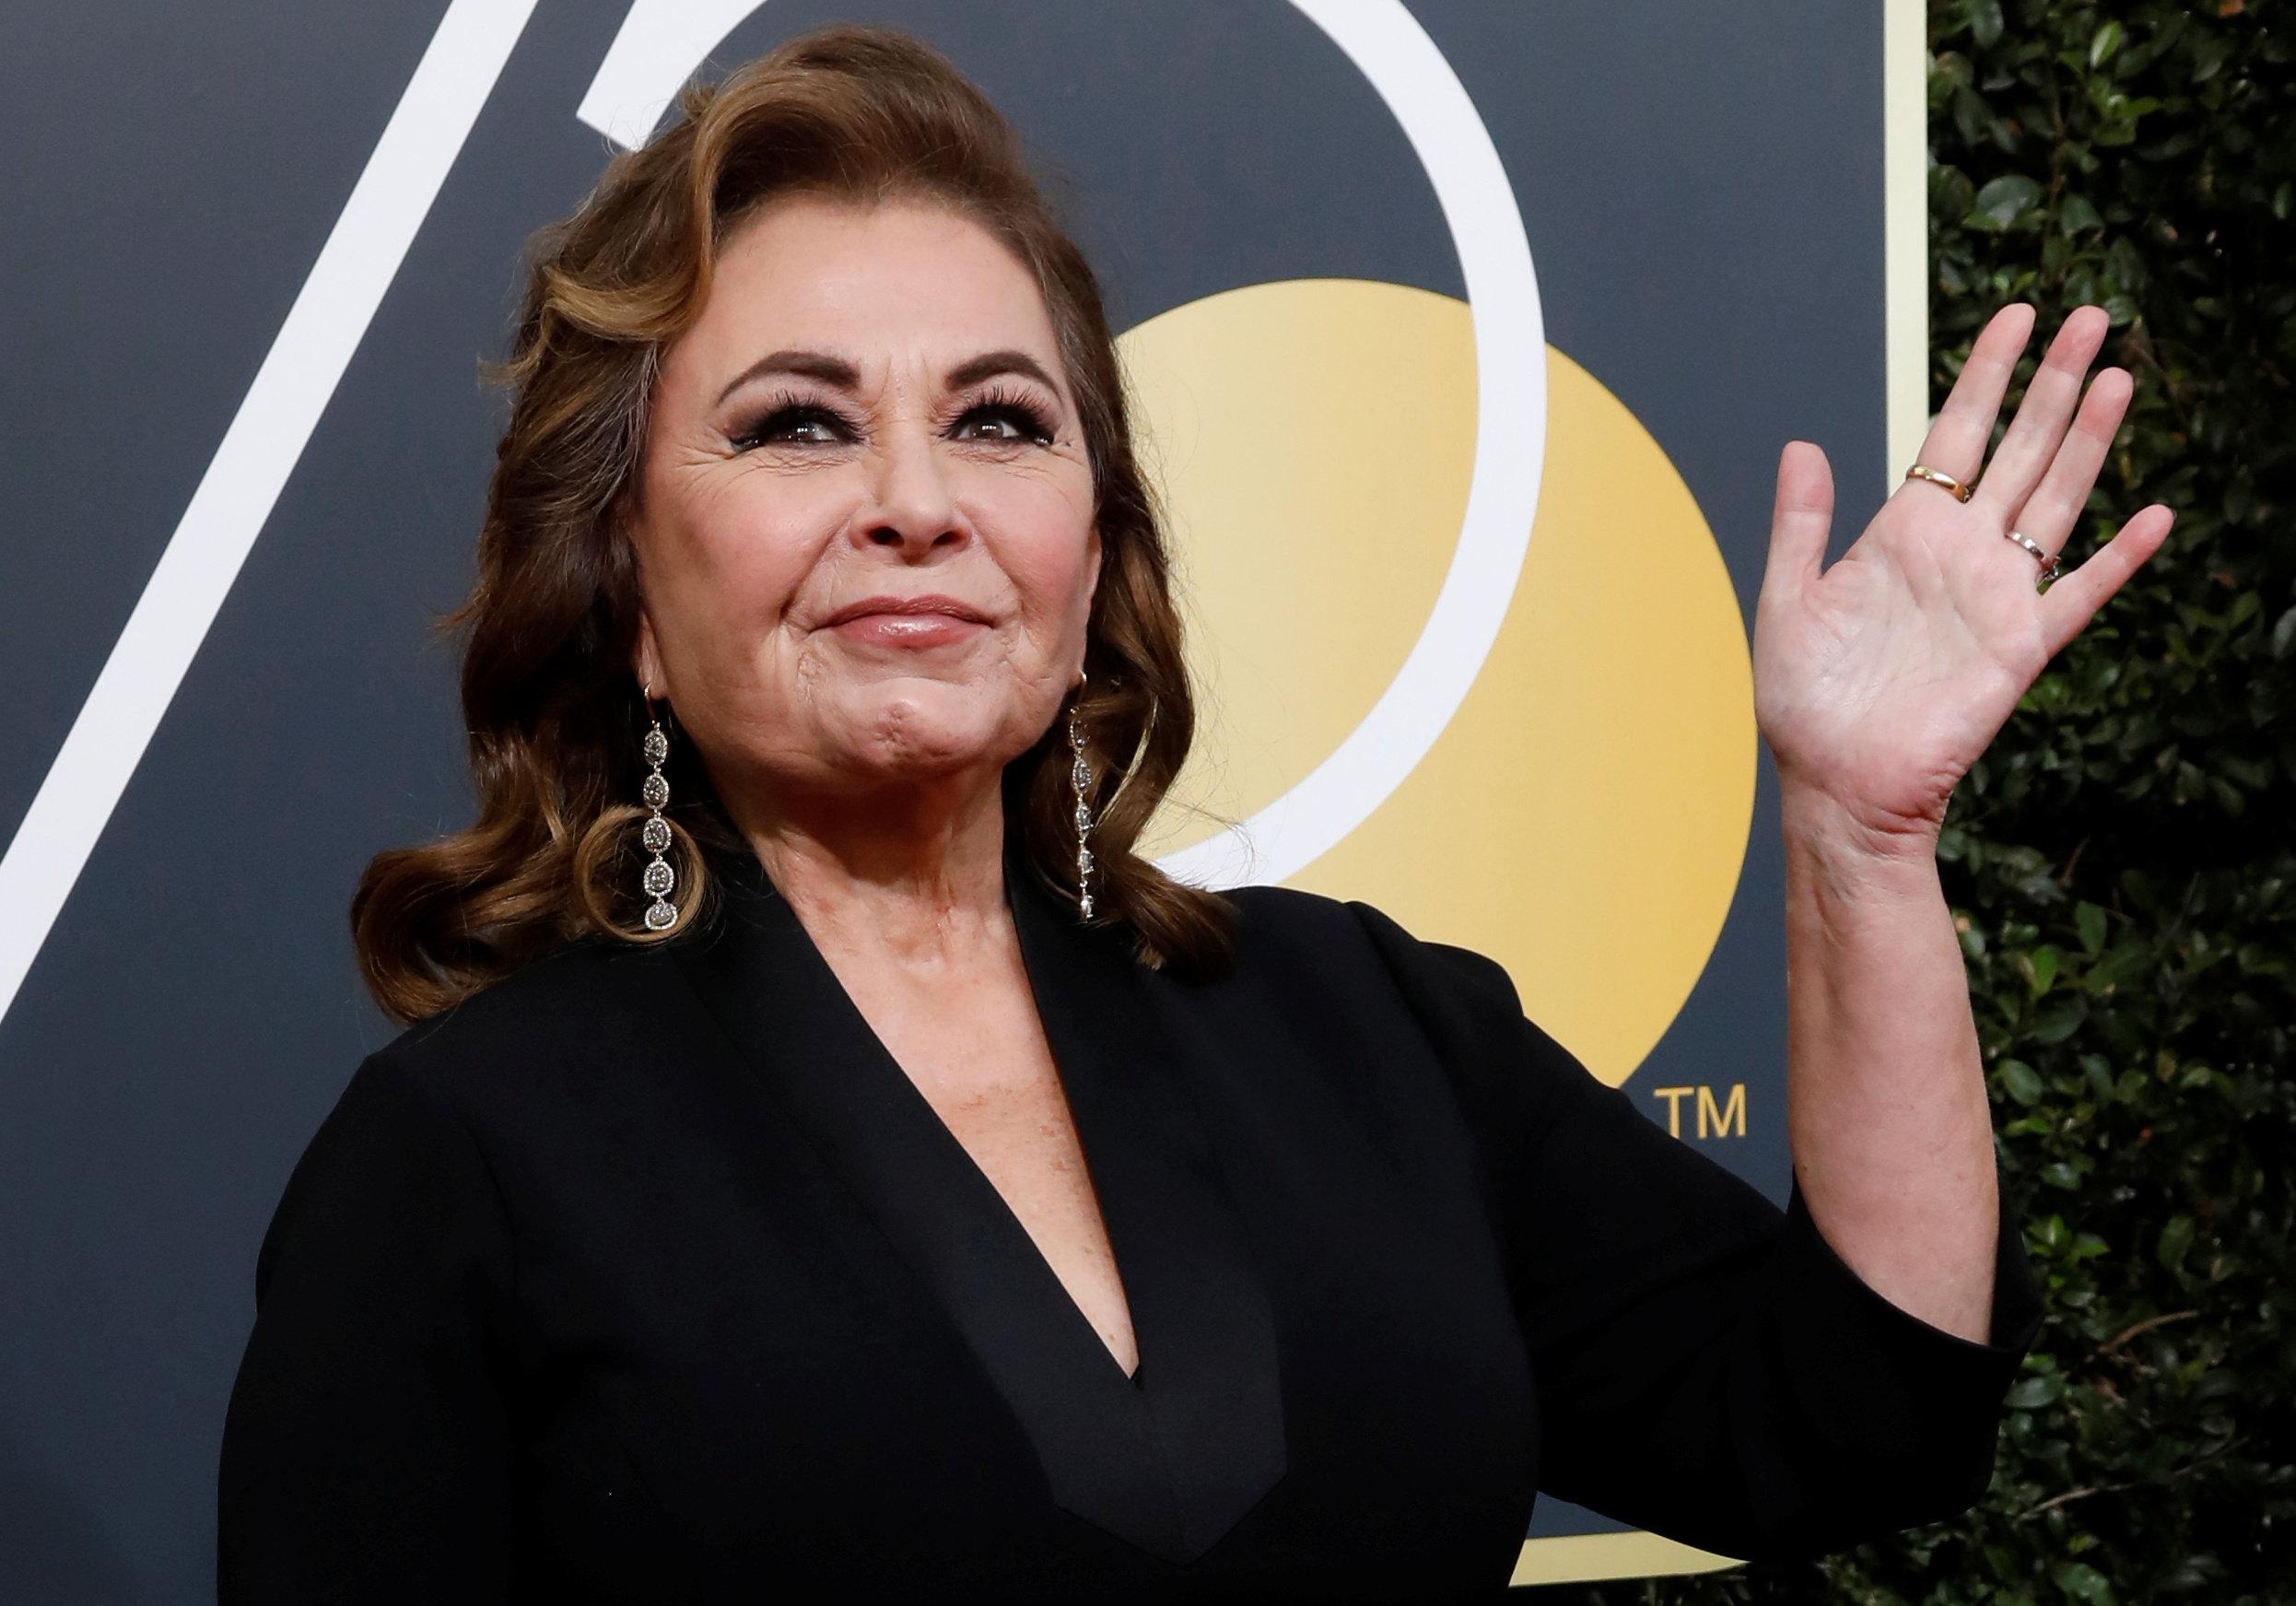 Roseanne Bar at thethe 75th Golden Globe Awards in 2018.